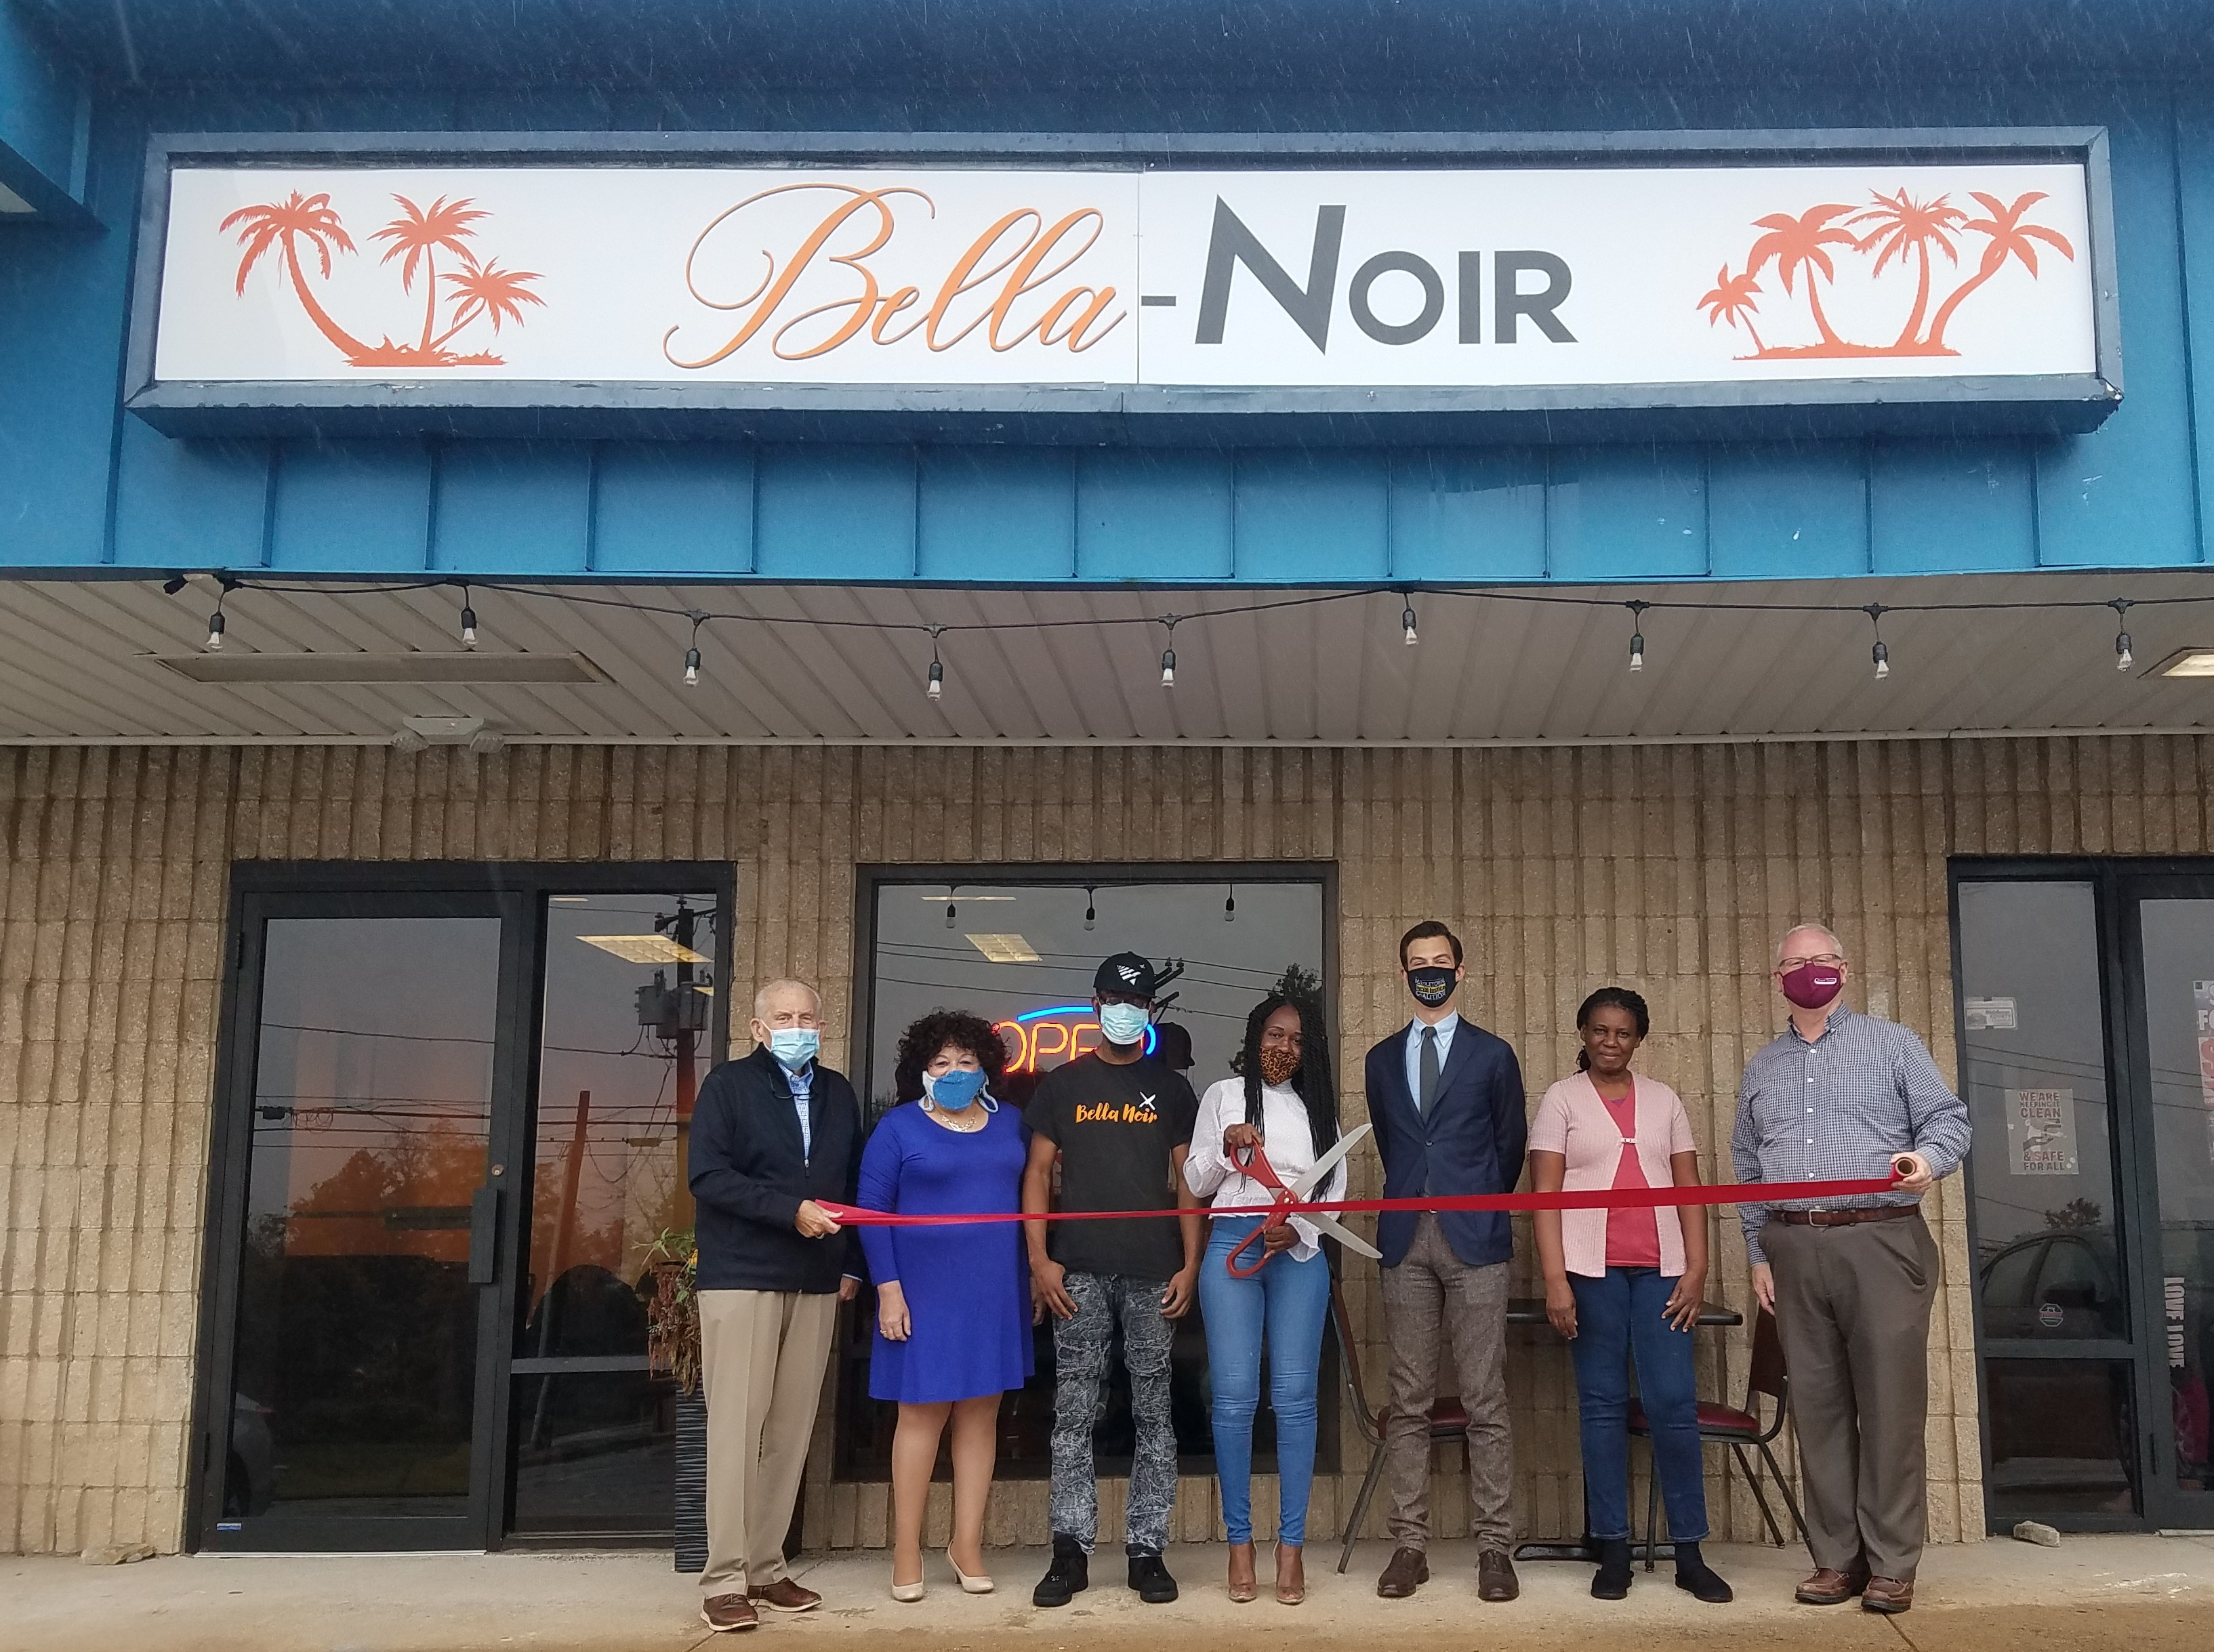 Bella Noir Caribbean Restaurant